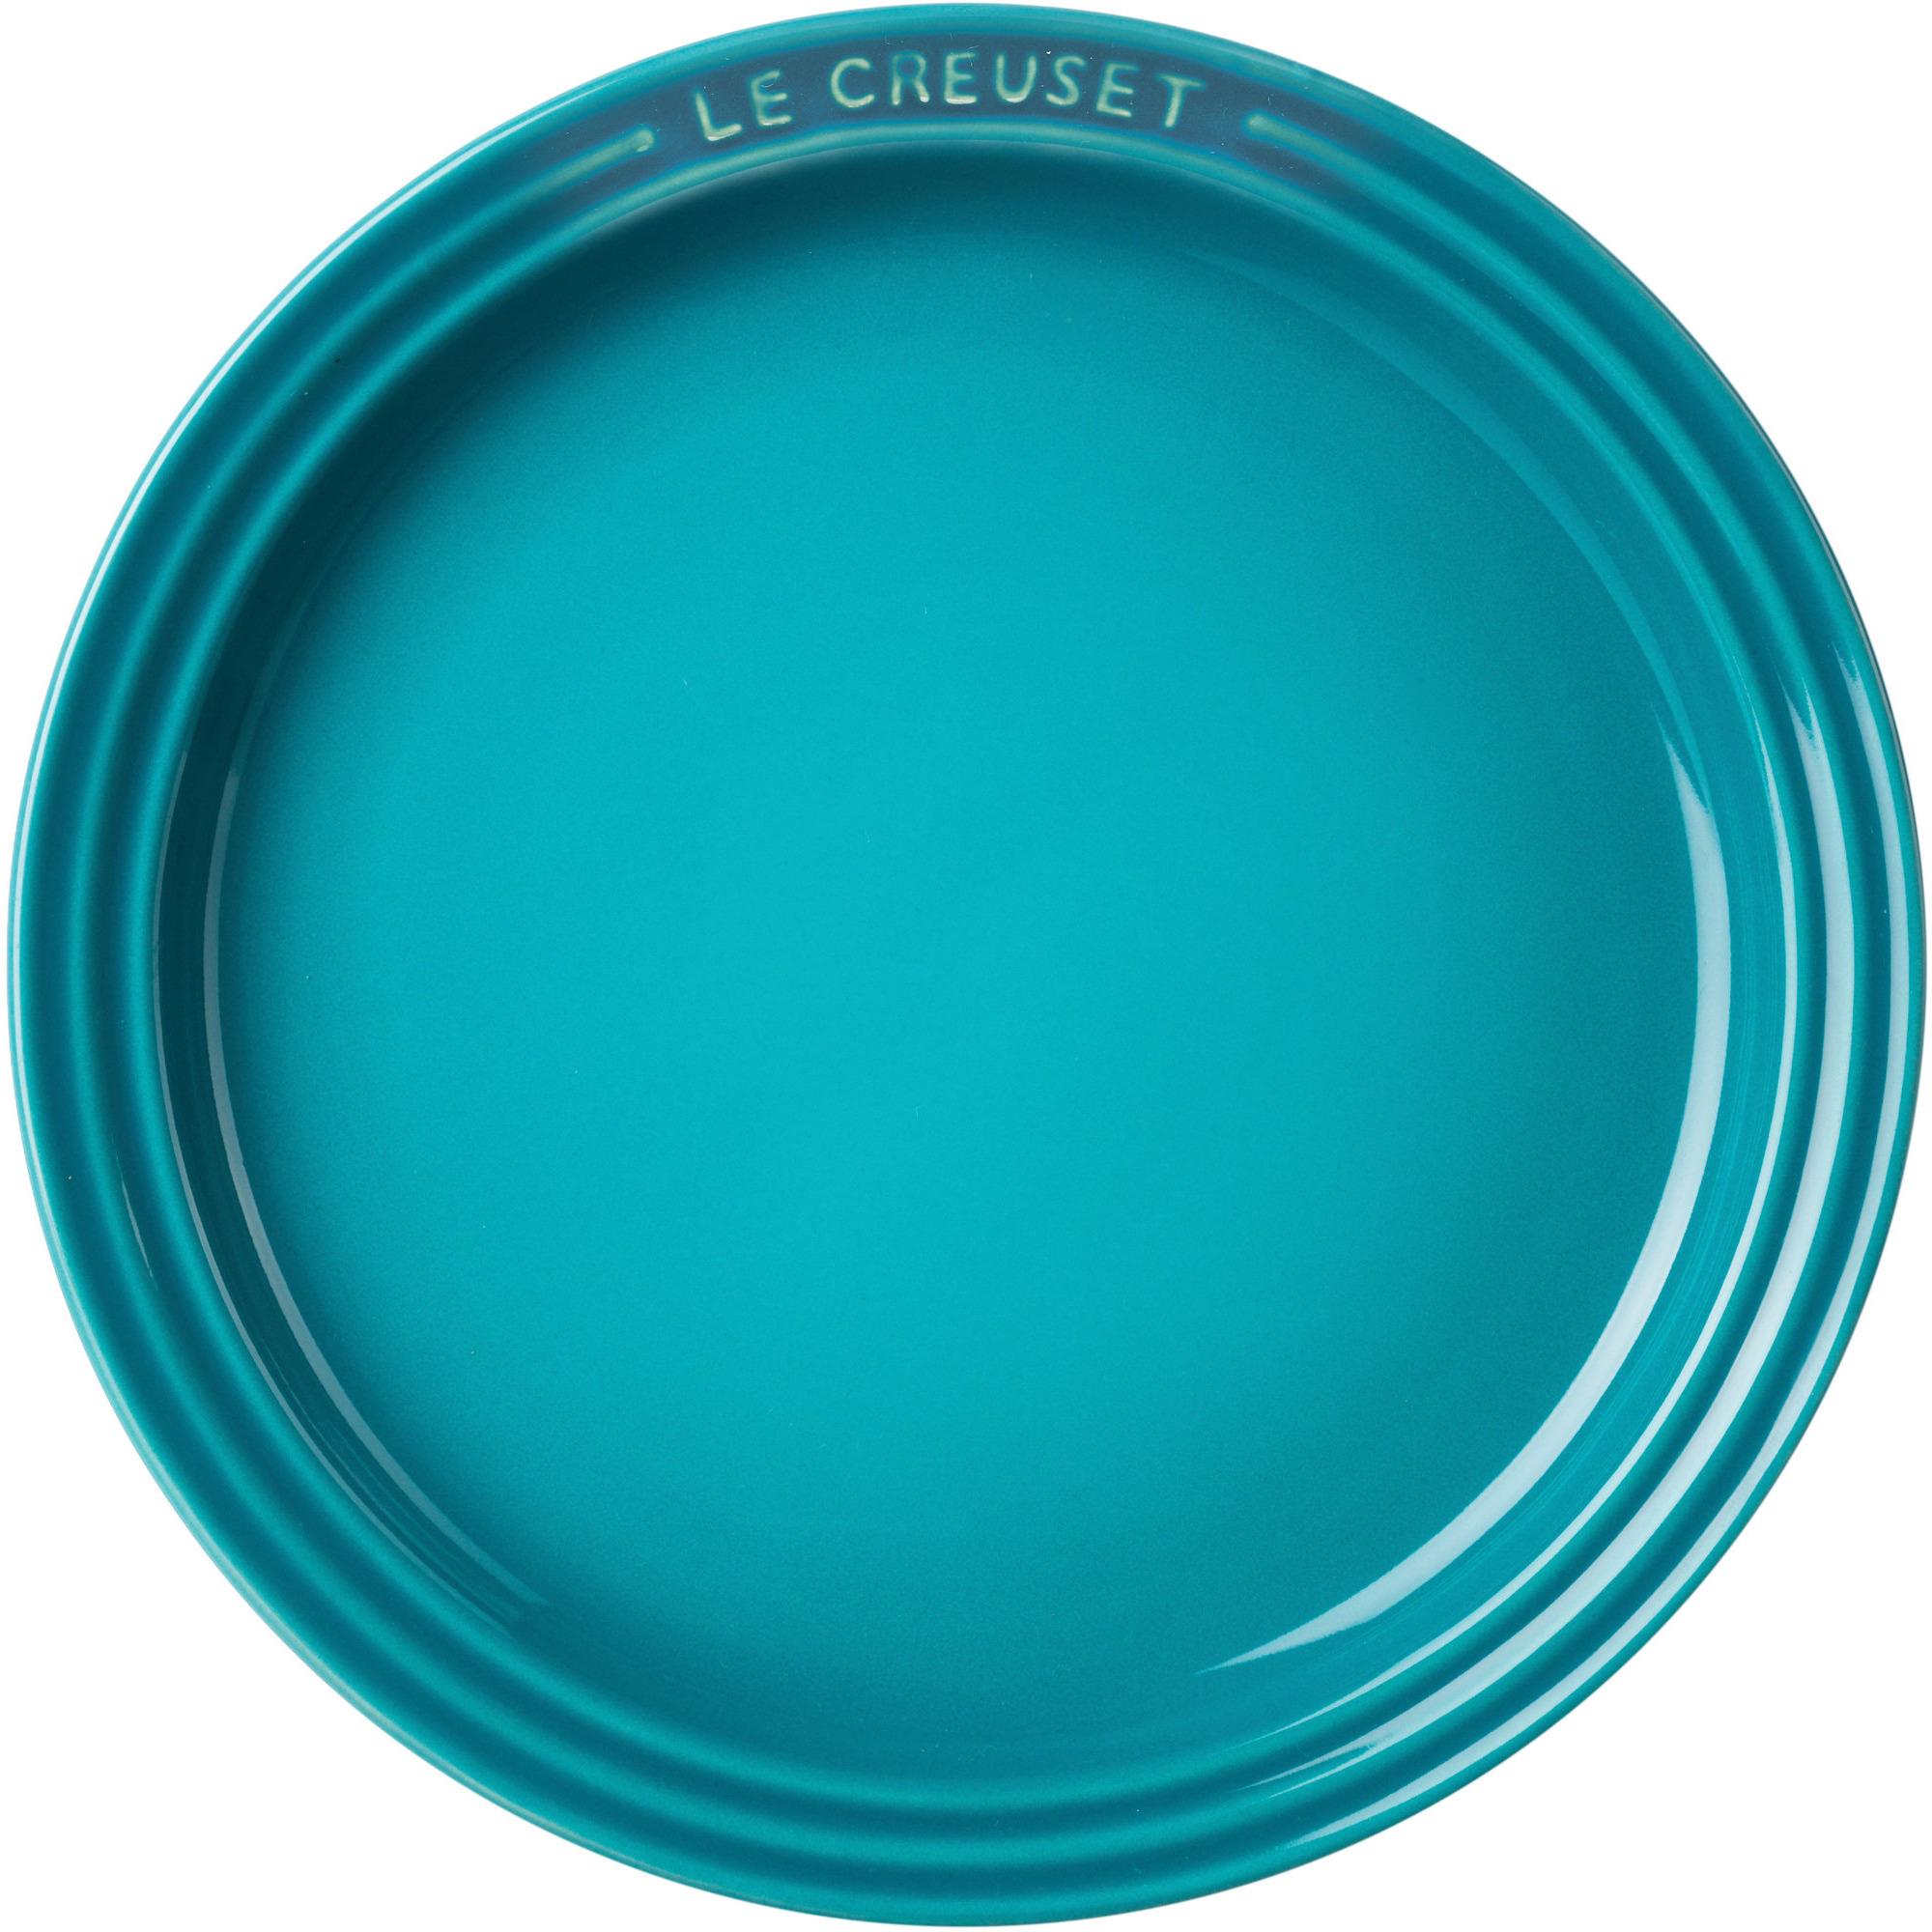 Le Creuset Lunchtallrik 23 cm Caribbean